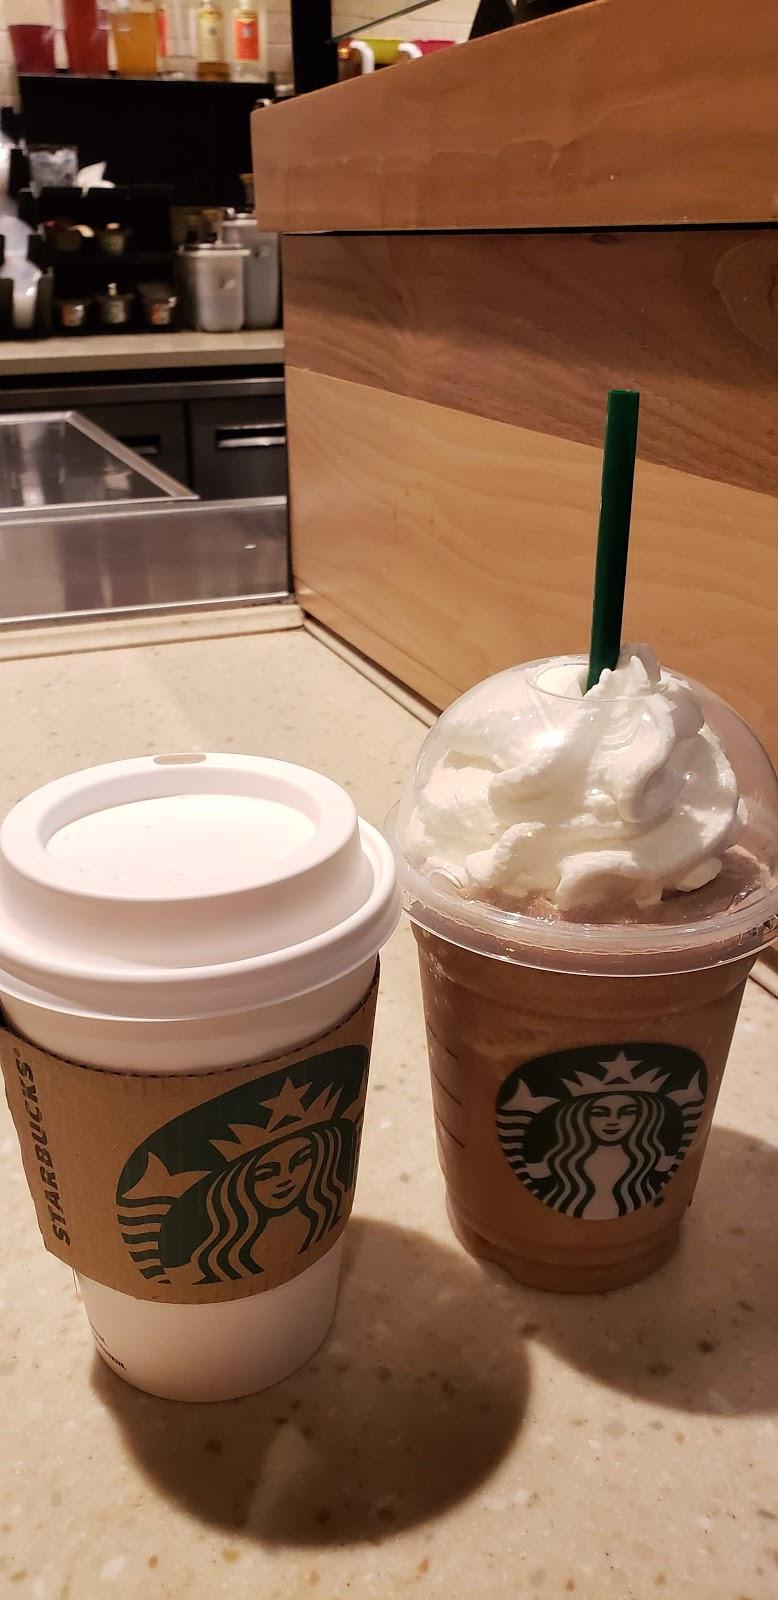 Starbucks - cafe  | Photo 5 of 10 | Address: 5894 W Thunderbird Rd #2, Glendale, AZ 85306, USA | Phone: (602) 942-8923